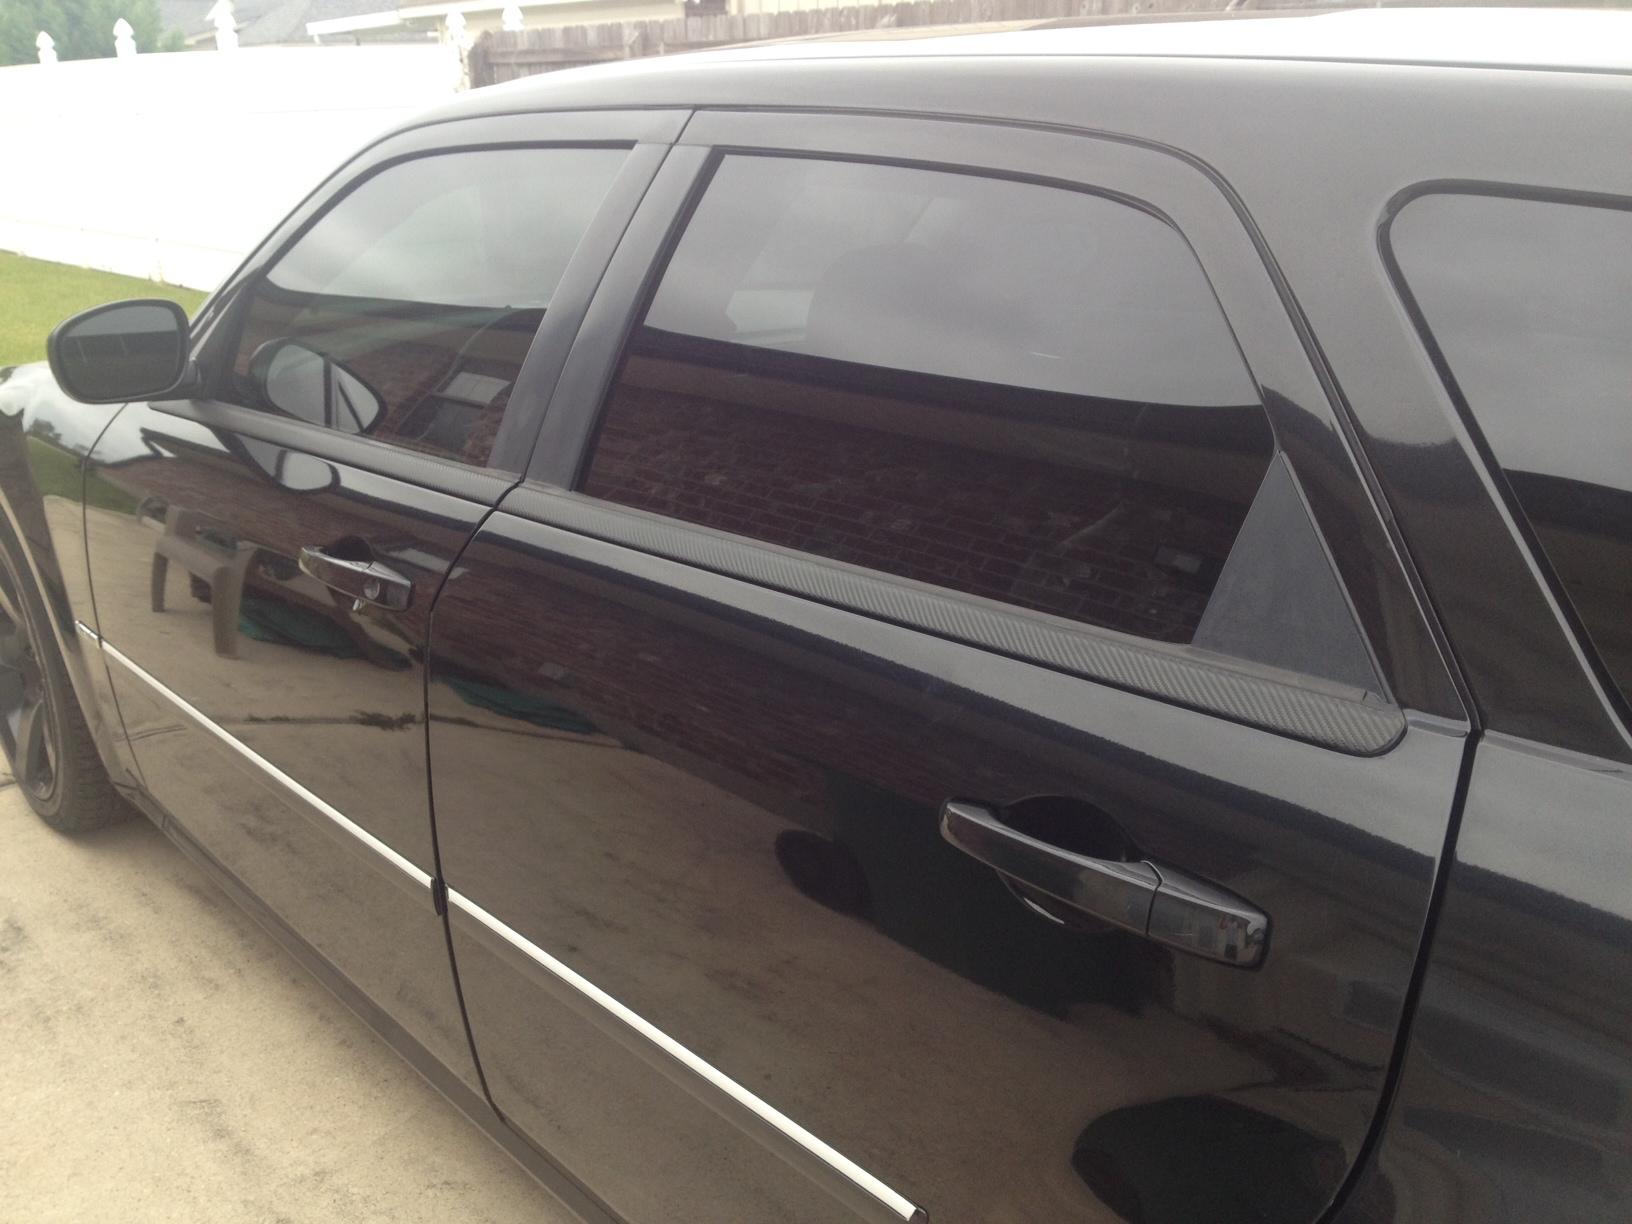 Carbon Fiber Wrap On Faded Window Trim Install Progress